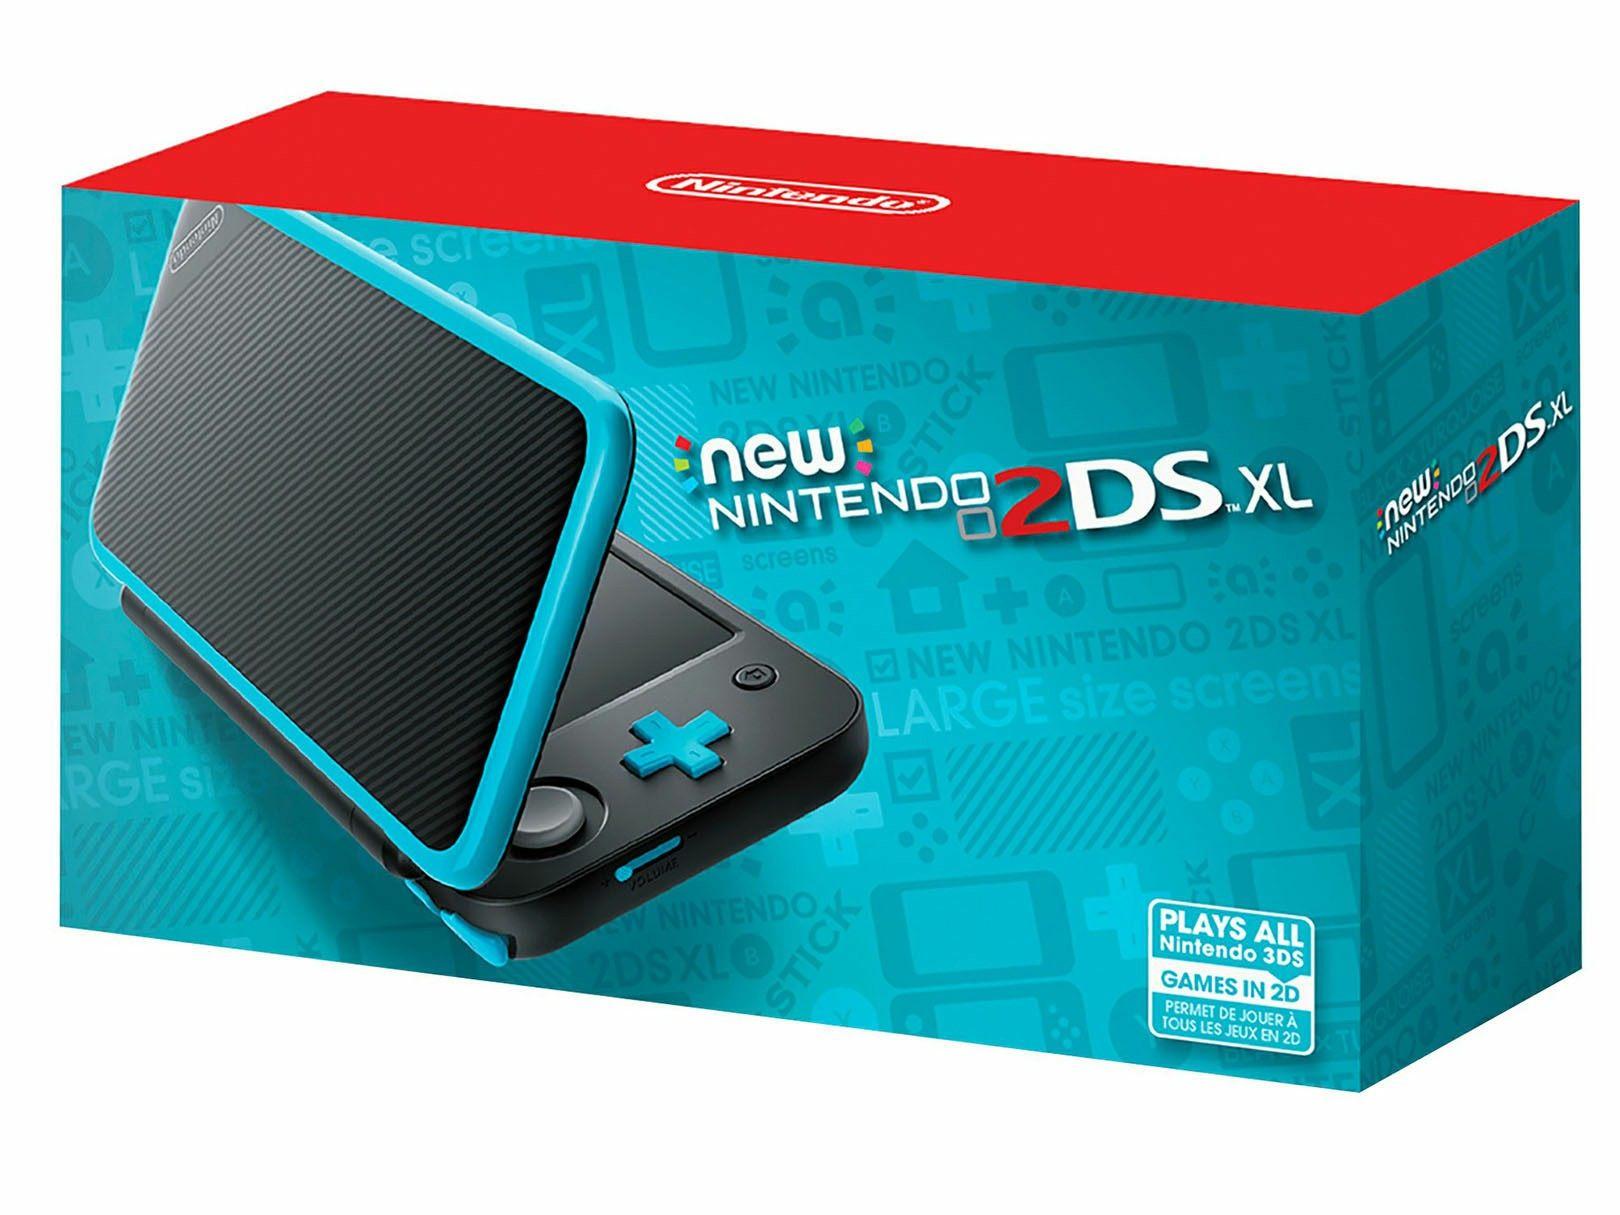 Liverpool: Consola New Nintendo 2DS XL (con paypal - citybanamex a 12 MSI)